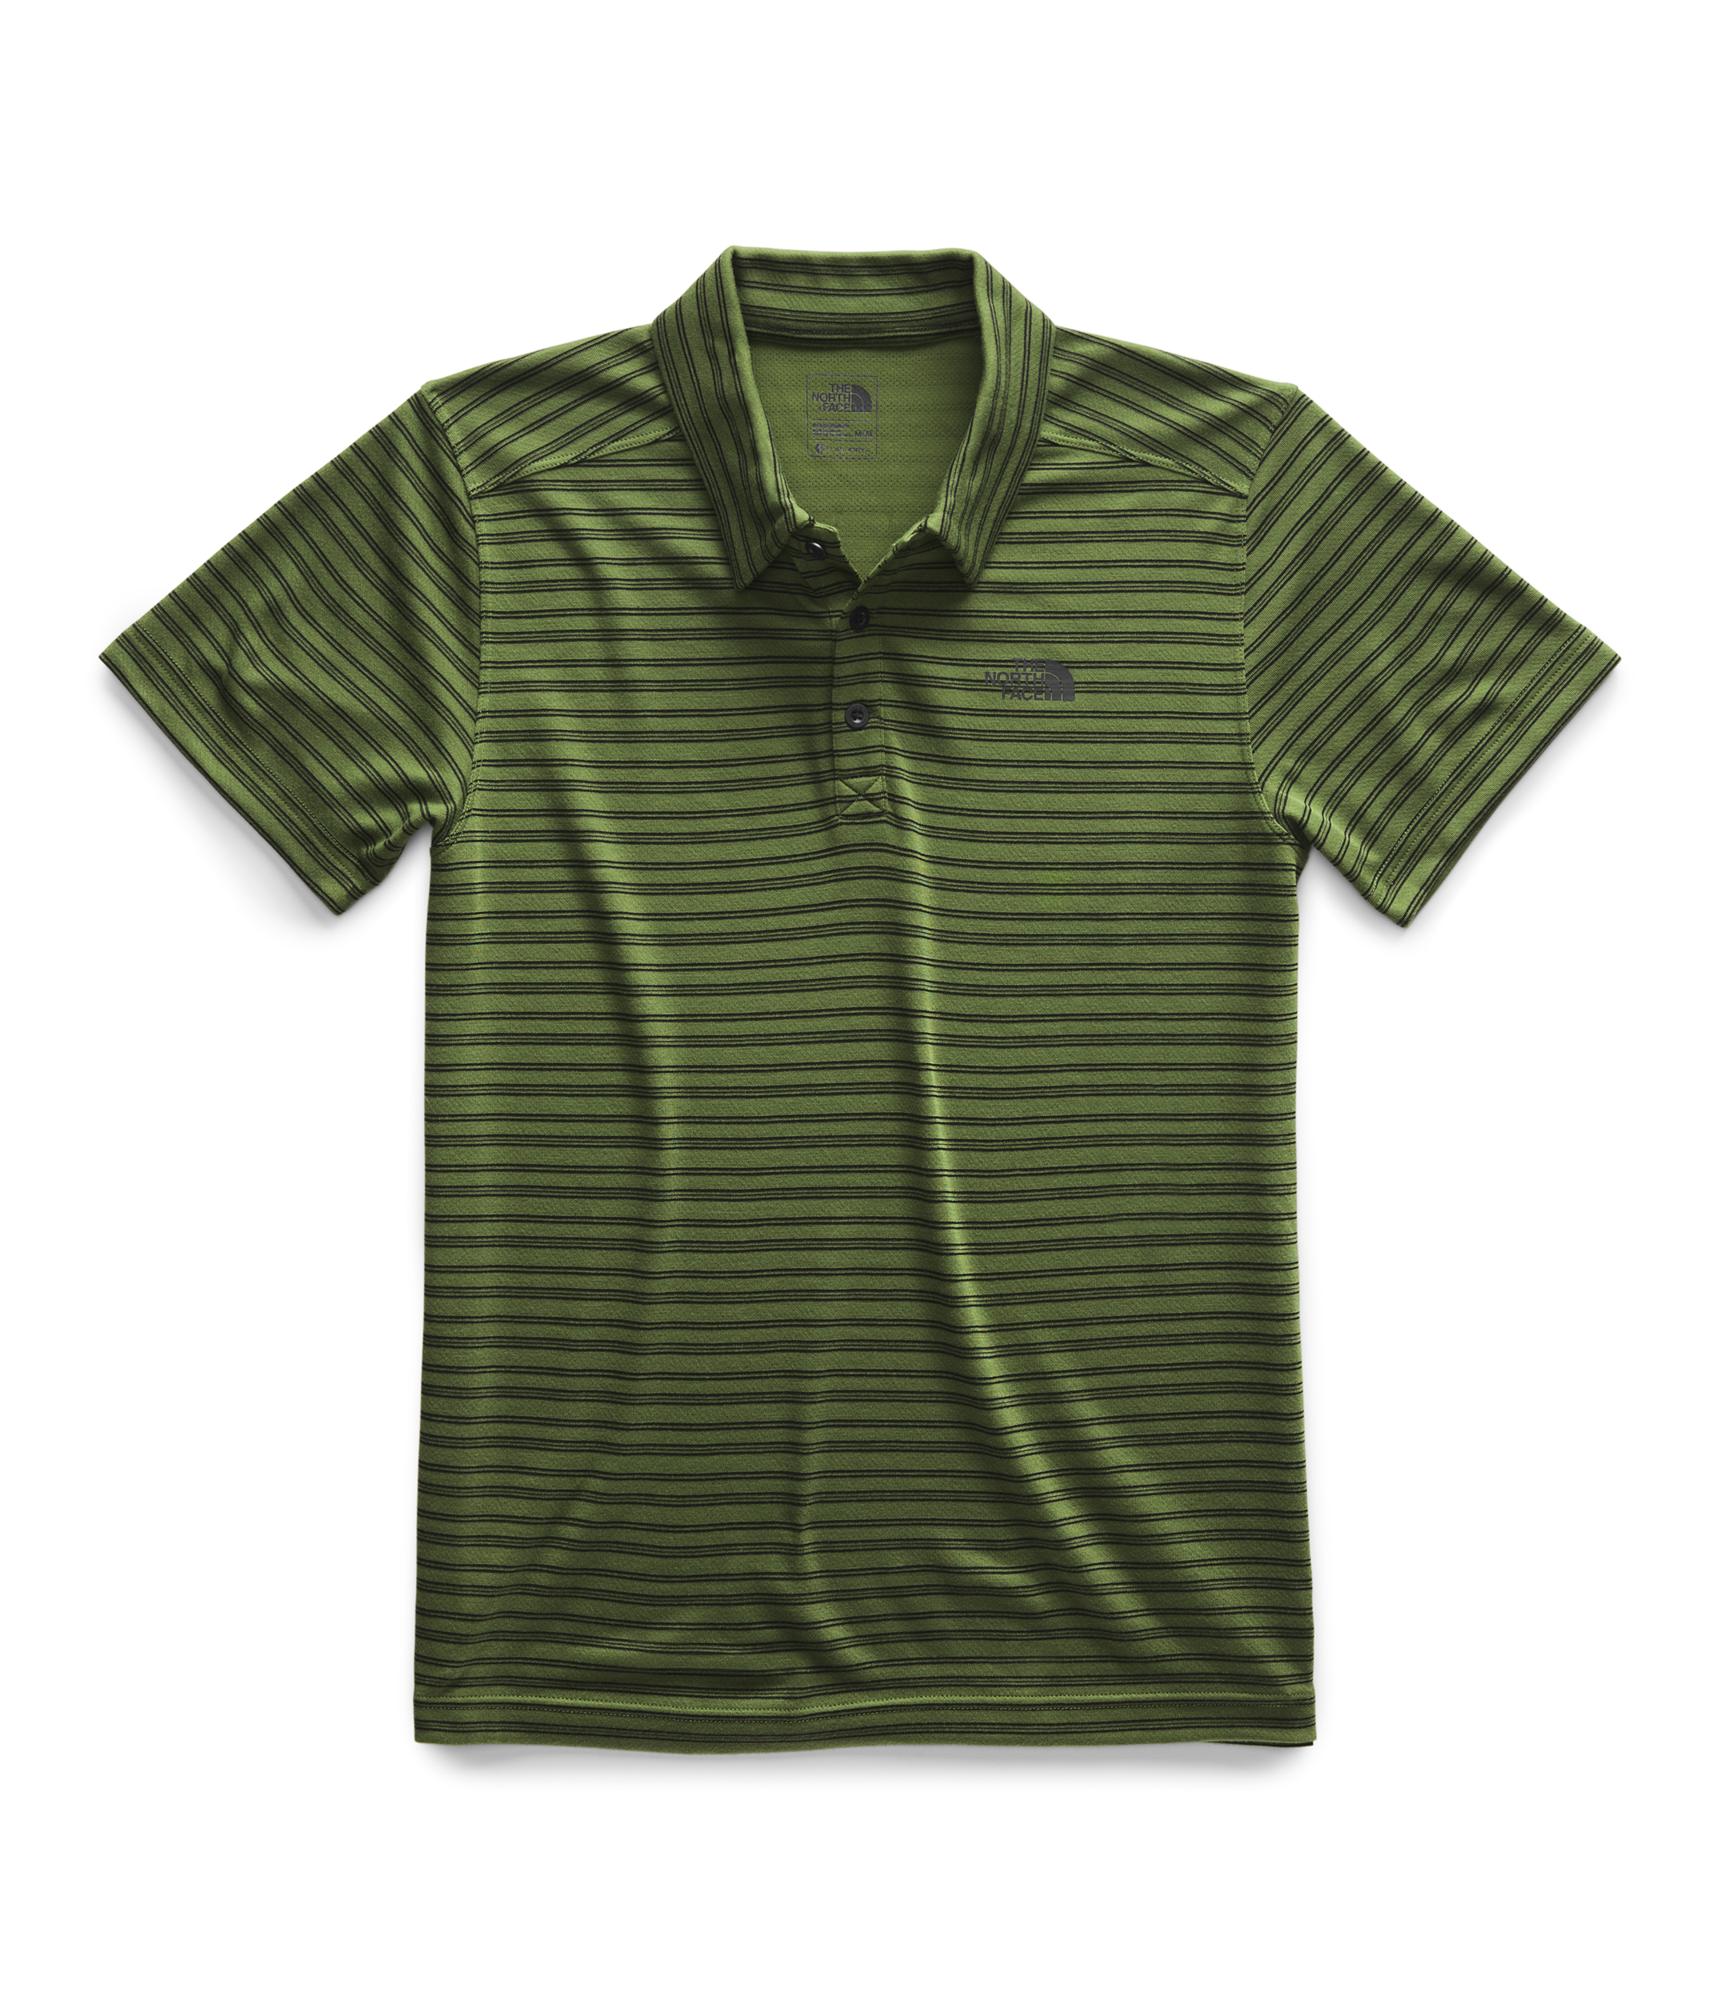 sekcja specjalna buty na codzień znana marka The North Face Crag Polo Shirt - Garden Green Stripe